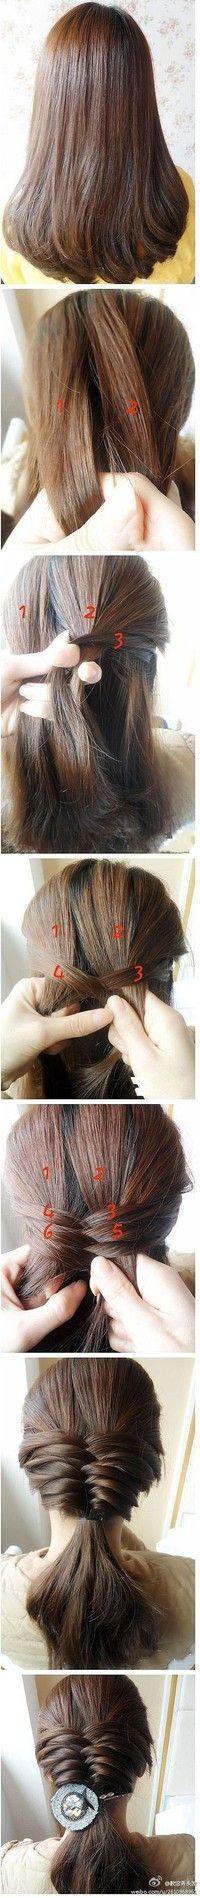 fishtail french braid